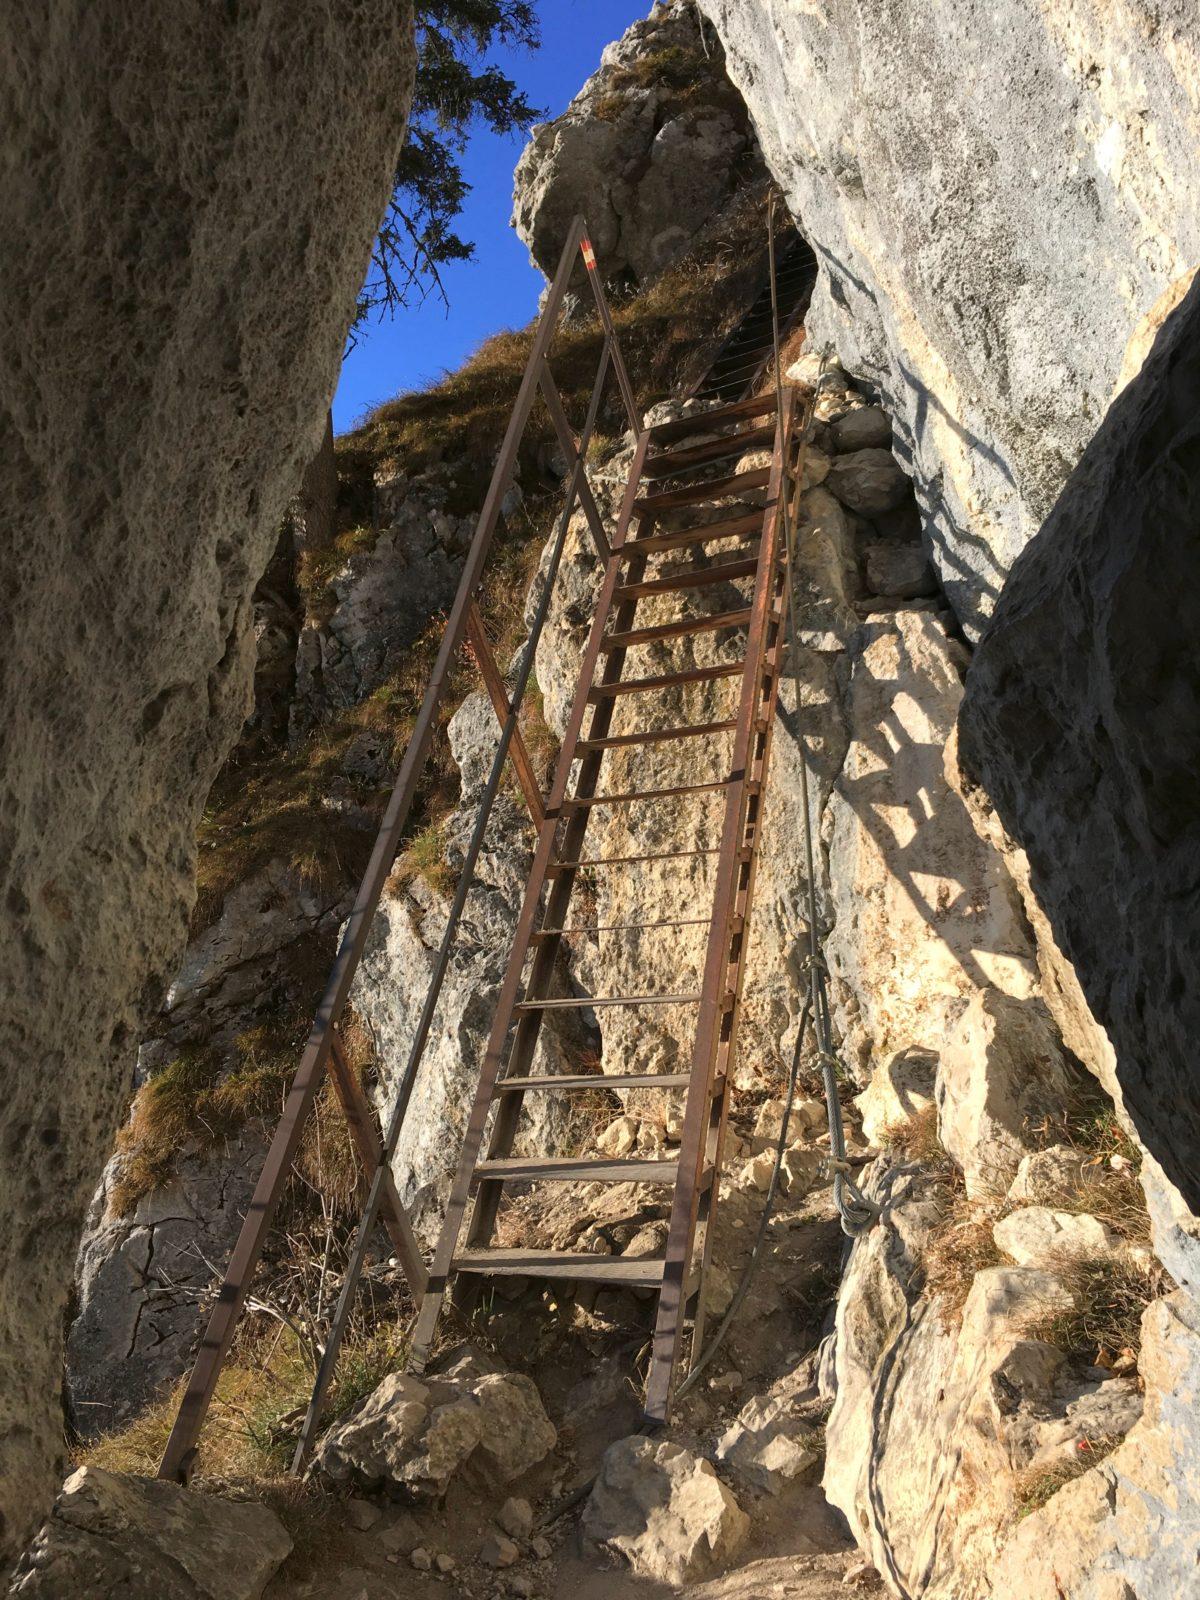 Stahltreppe im Klettersteig